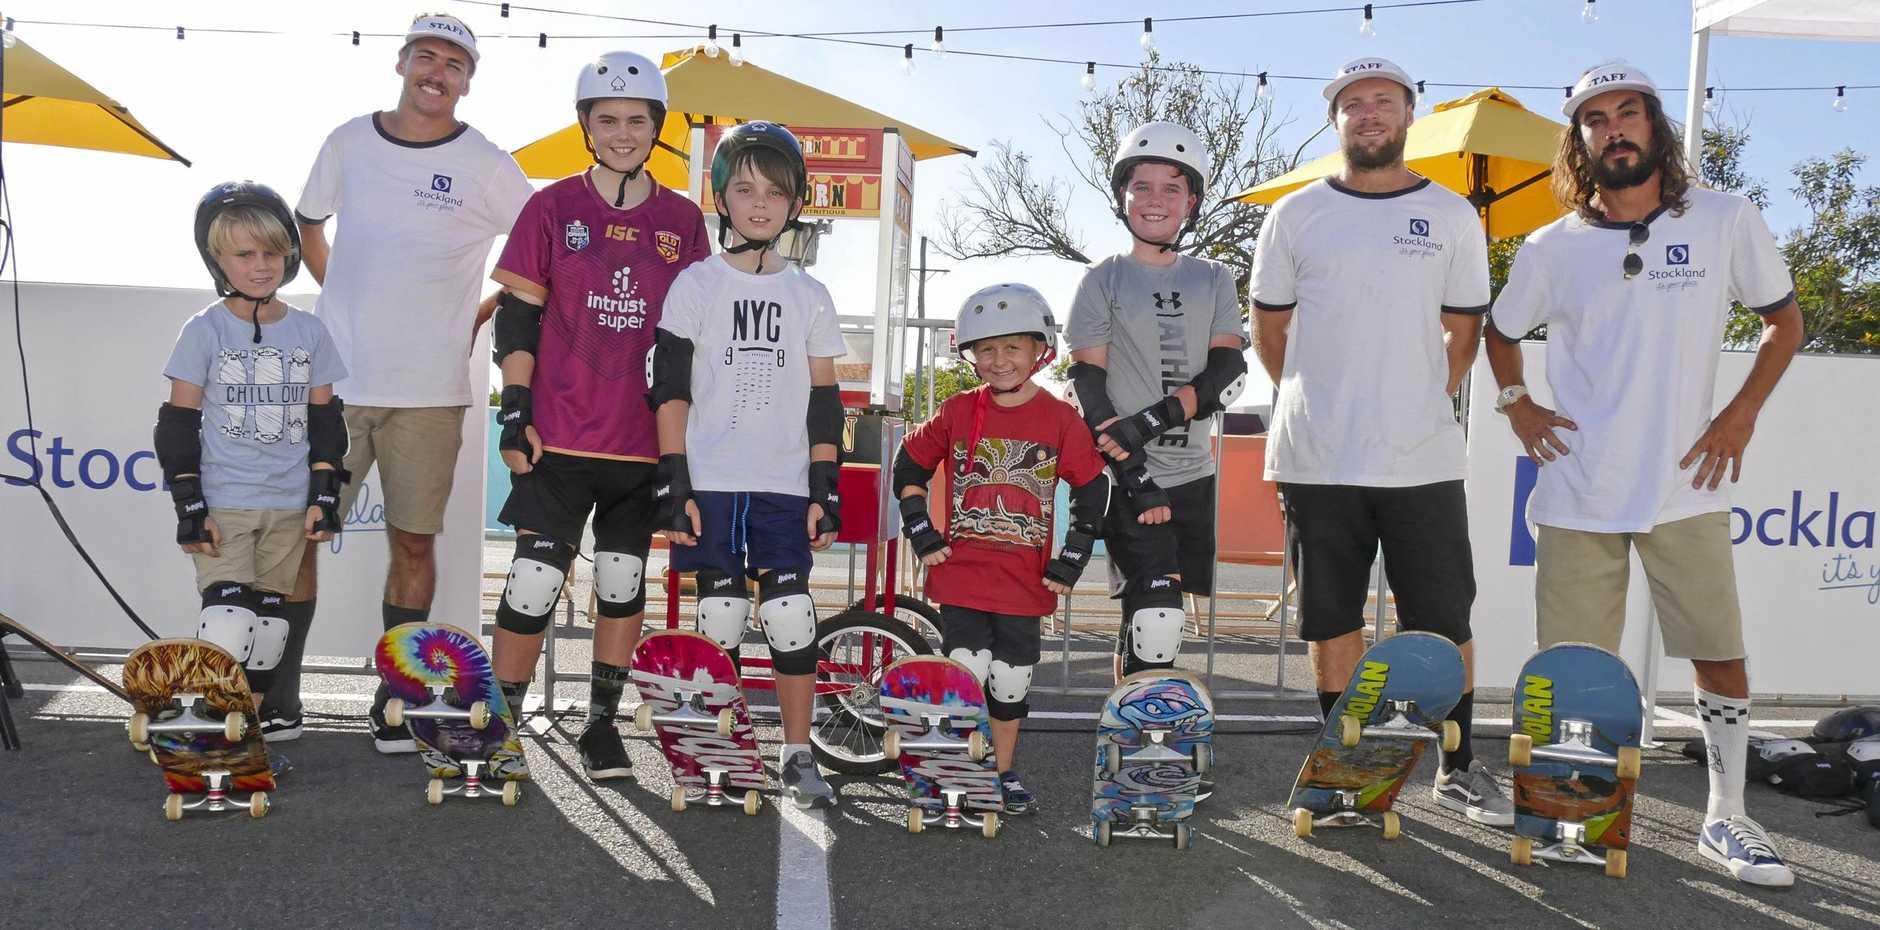 James Darby, 8, Aaron Hall, Ebony Taylor-Faint, 13, Corey Faint, 9, Ethan Darby, 6, Oliver Brown, 8, Felipe Hecher and Vitor Silveira.